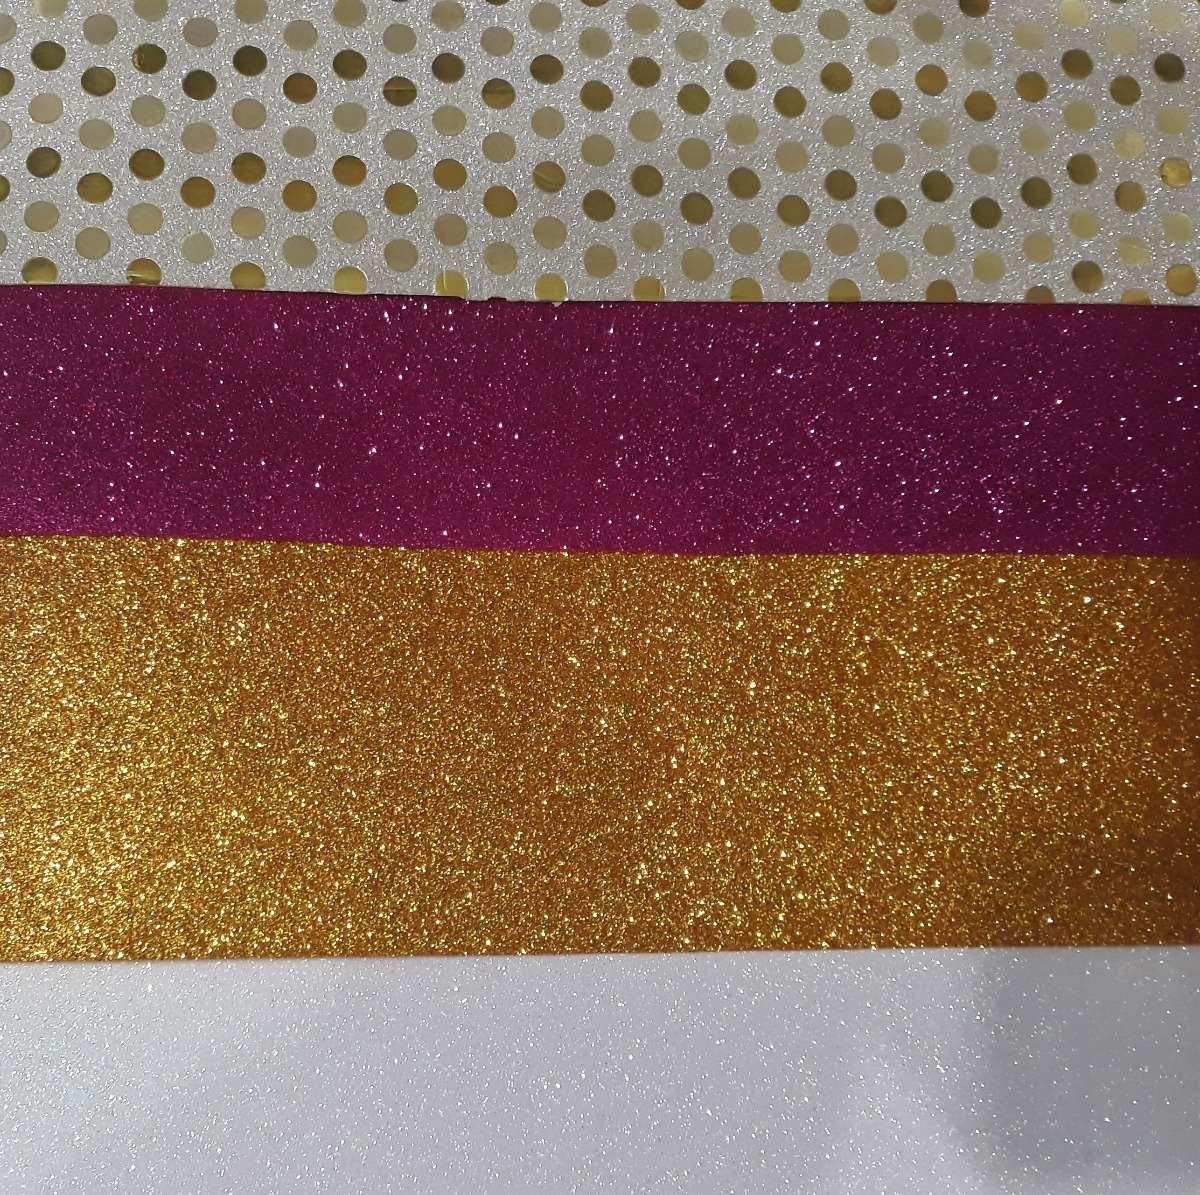 5e5036c0755 Goma Eva De Varios Colores Con Brillo Glitter X Unidad 40x60 -   78 ...